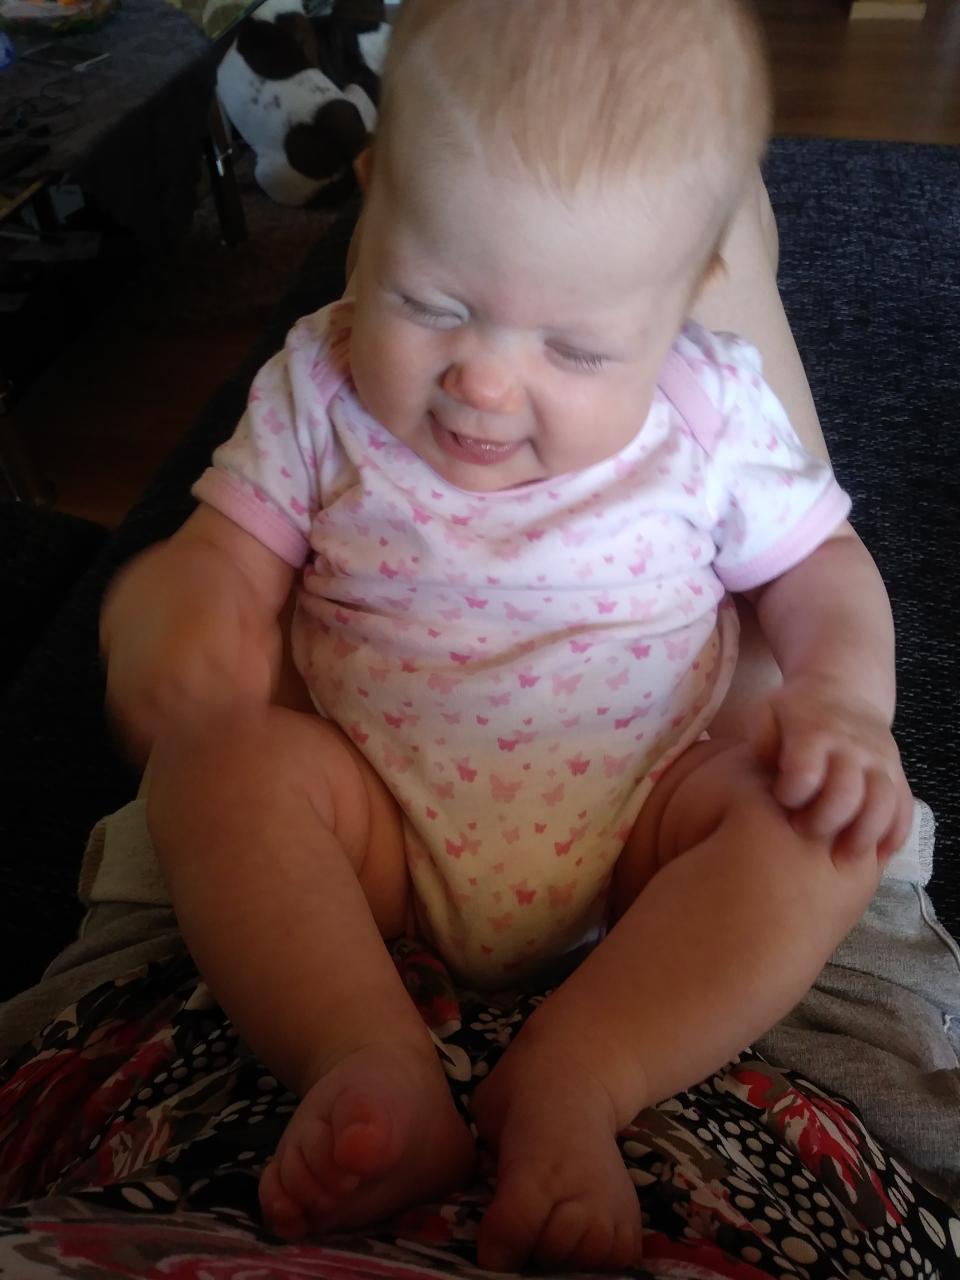 Sitzen Hochziehen Forum Baby Urbia De